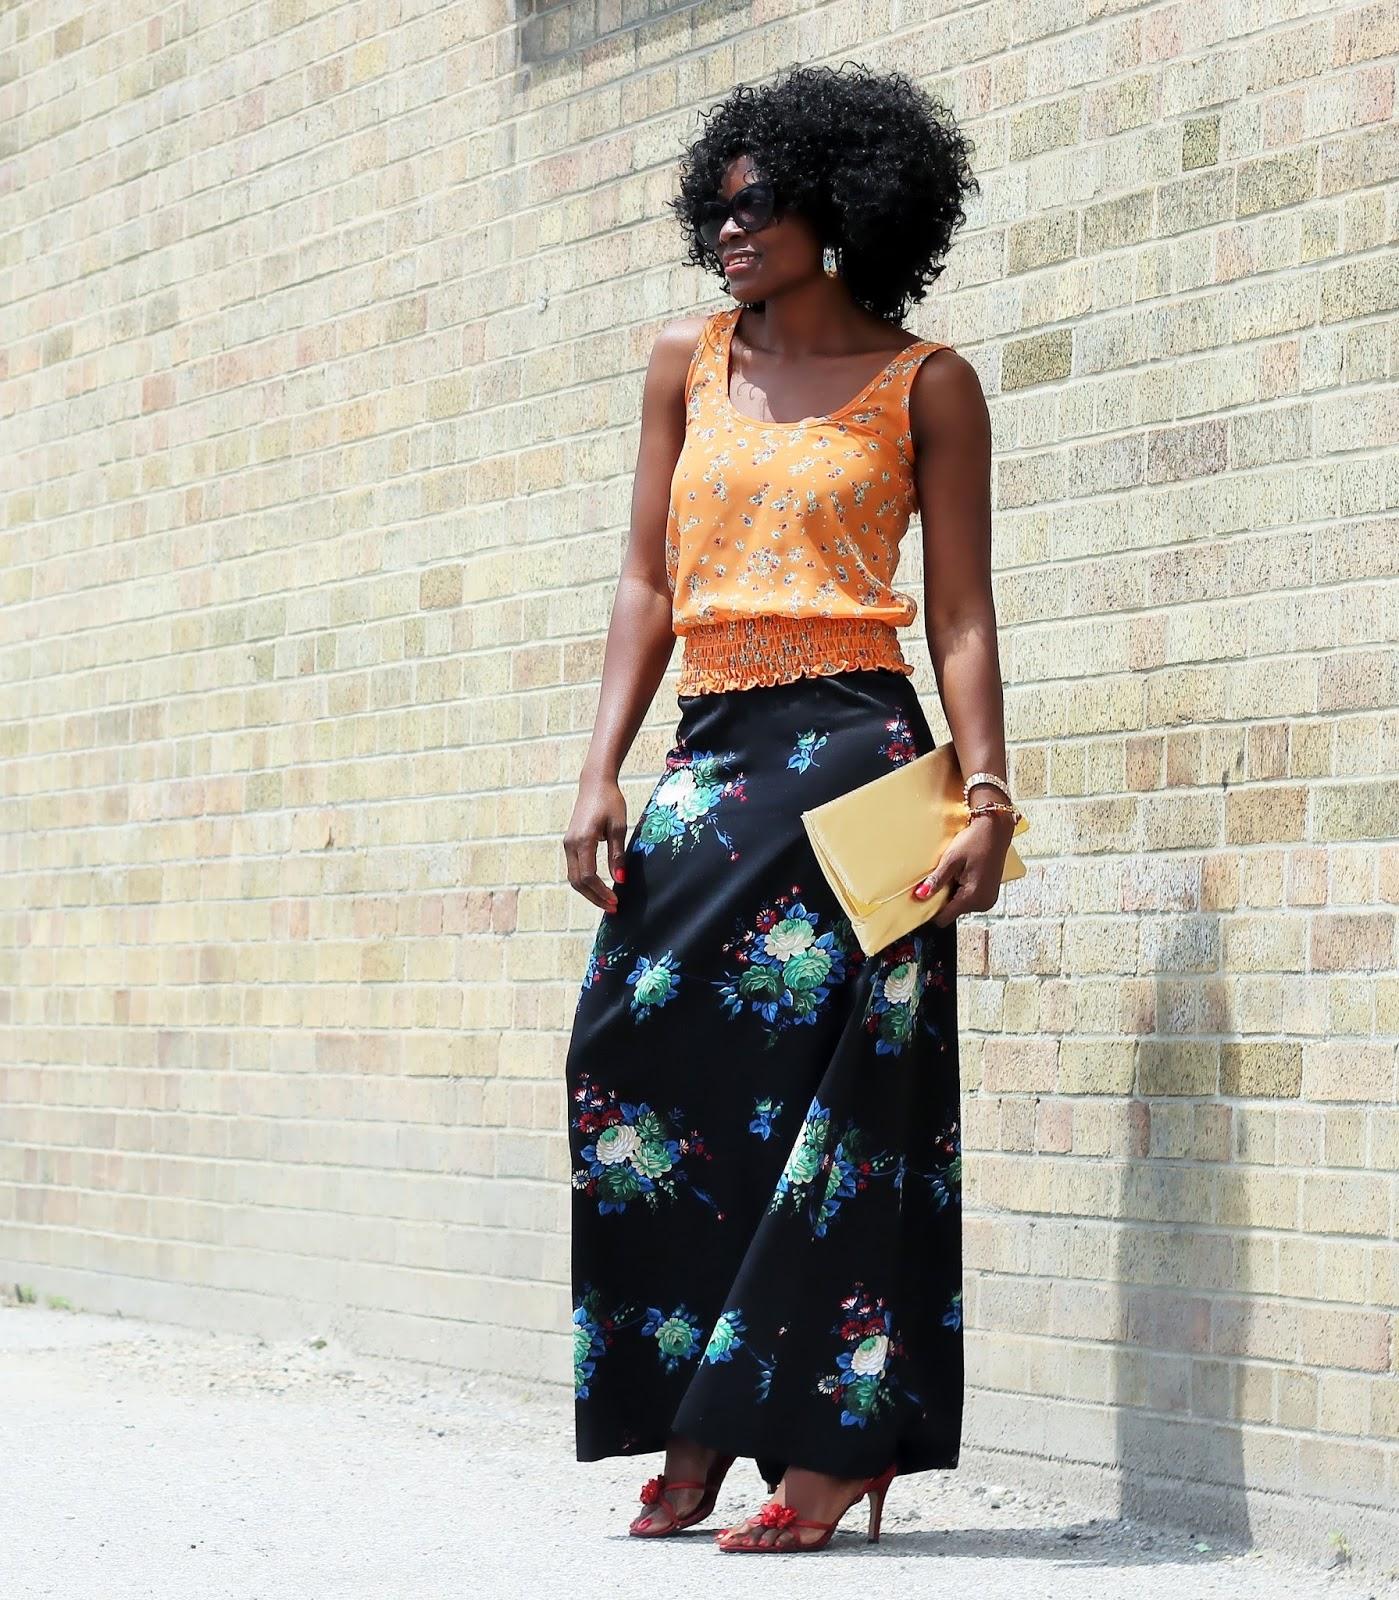 Floral Print Maxi Skirt x Floral Print Top